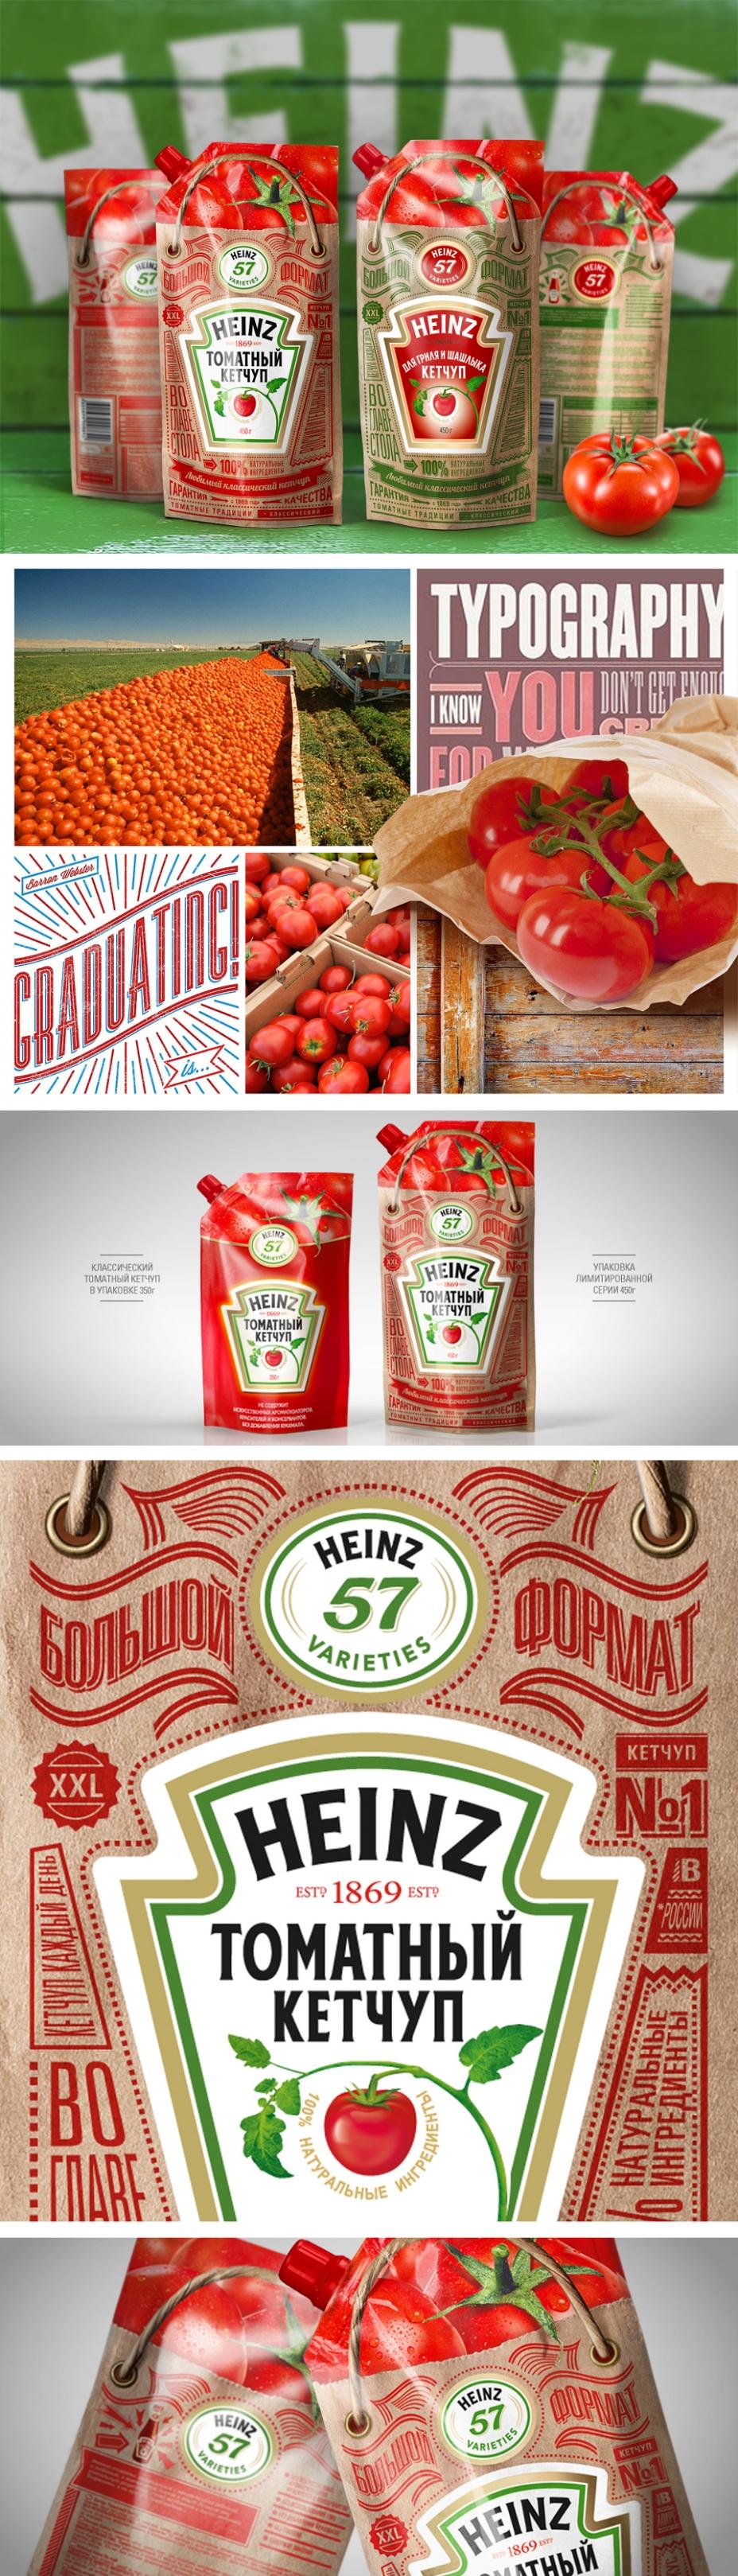 Упаковка, бренд: Heinz, агентство: Depot WPF